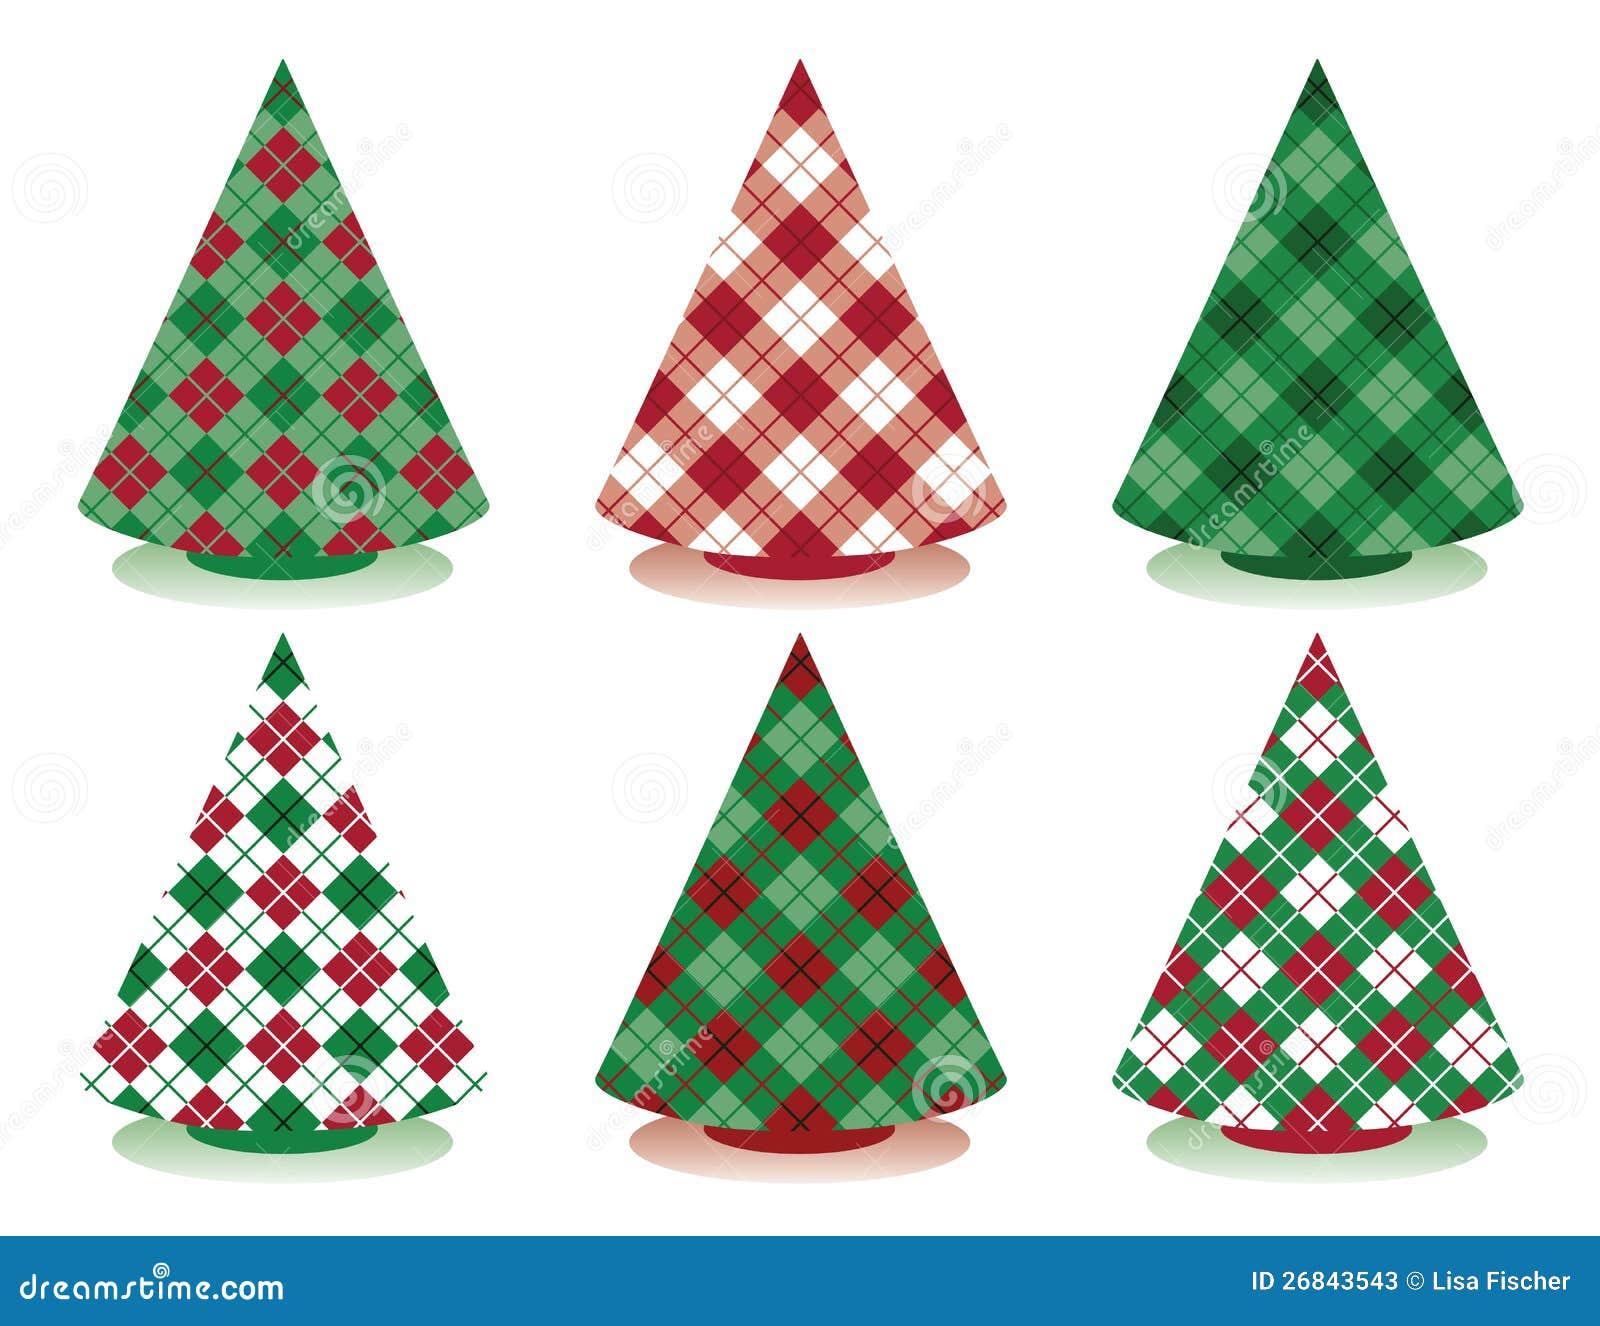 Plaid Christmas Tree Plaid Christmas Trees Stock Photos Image 26843543